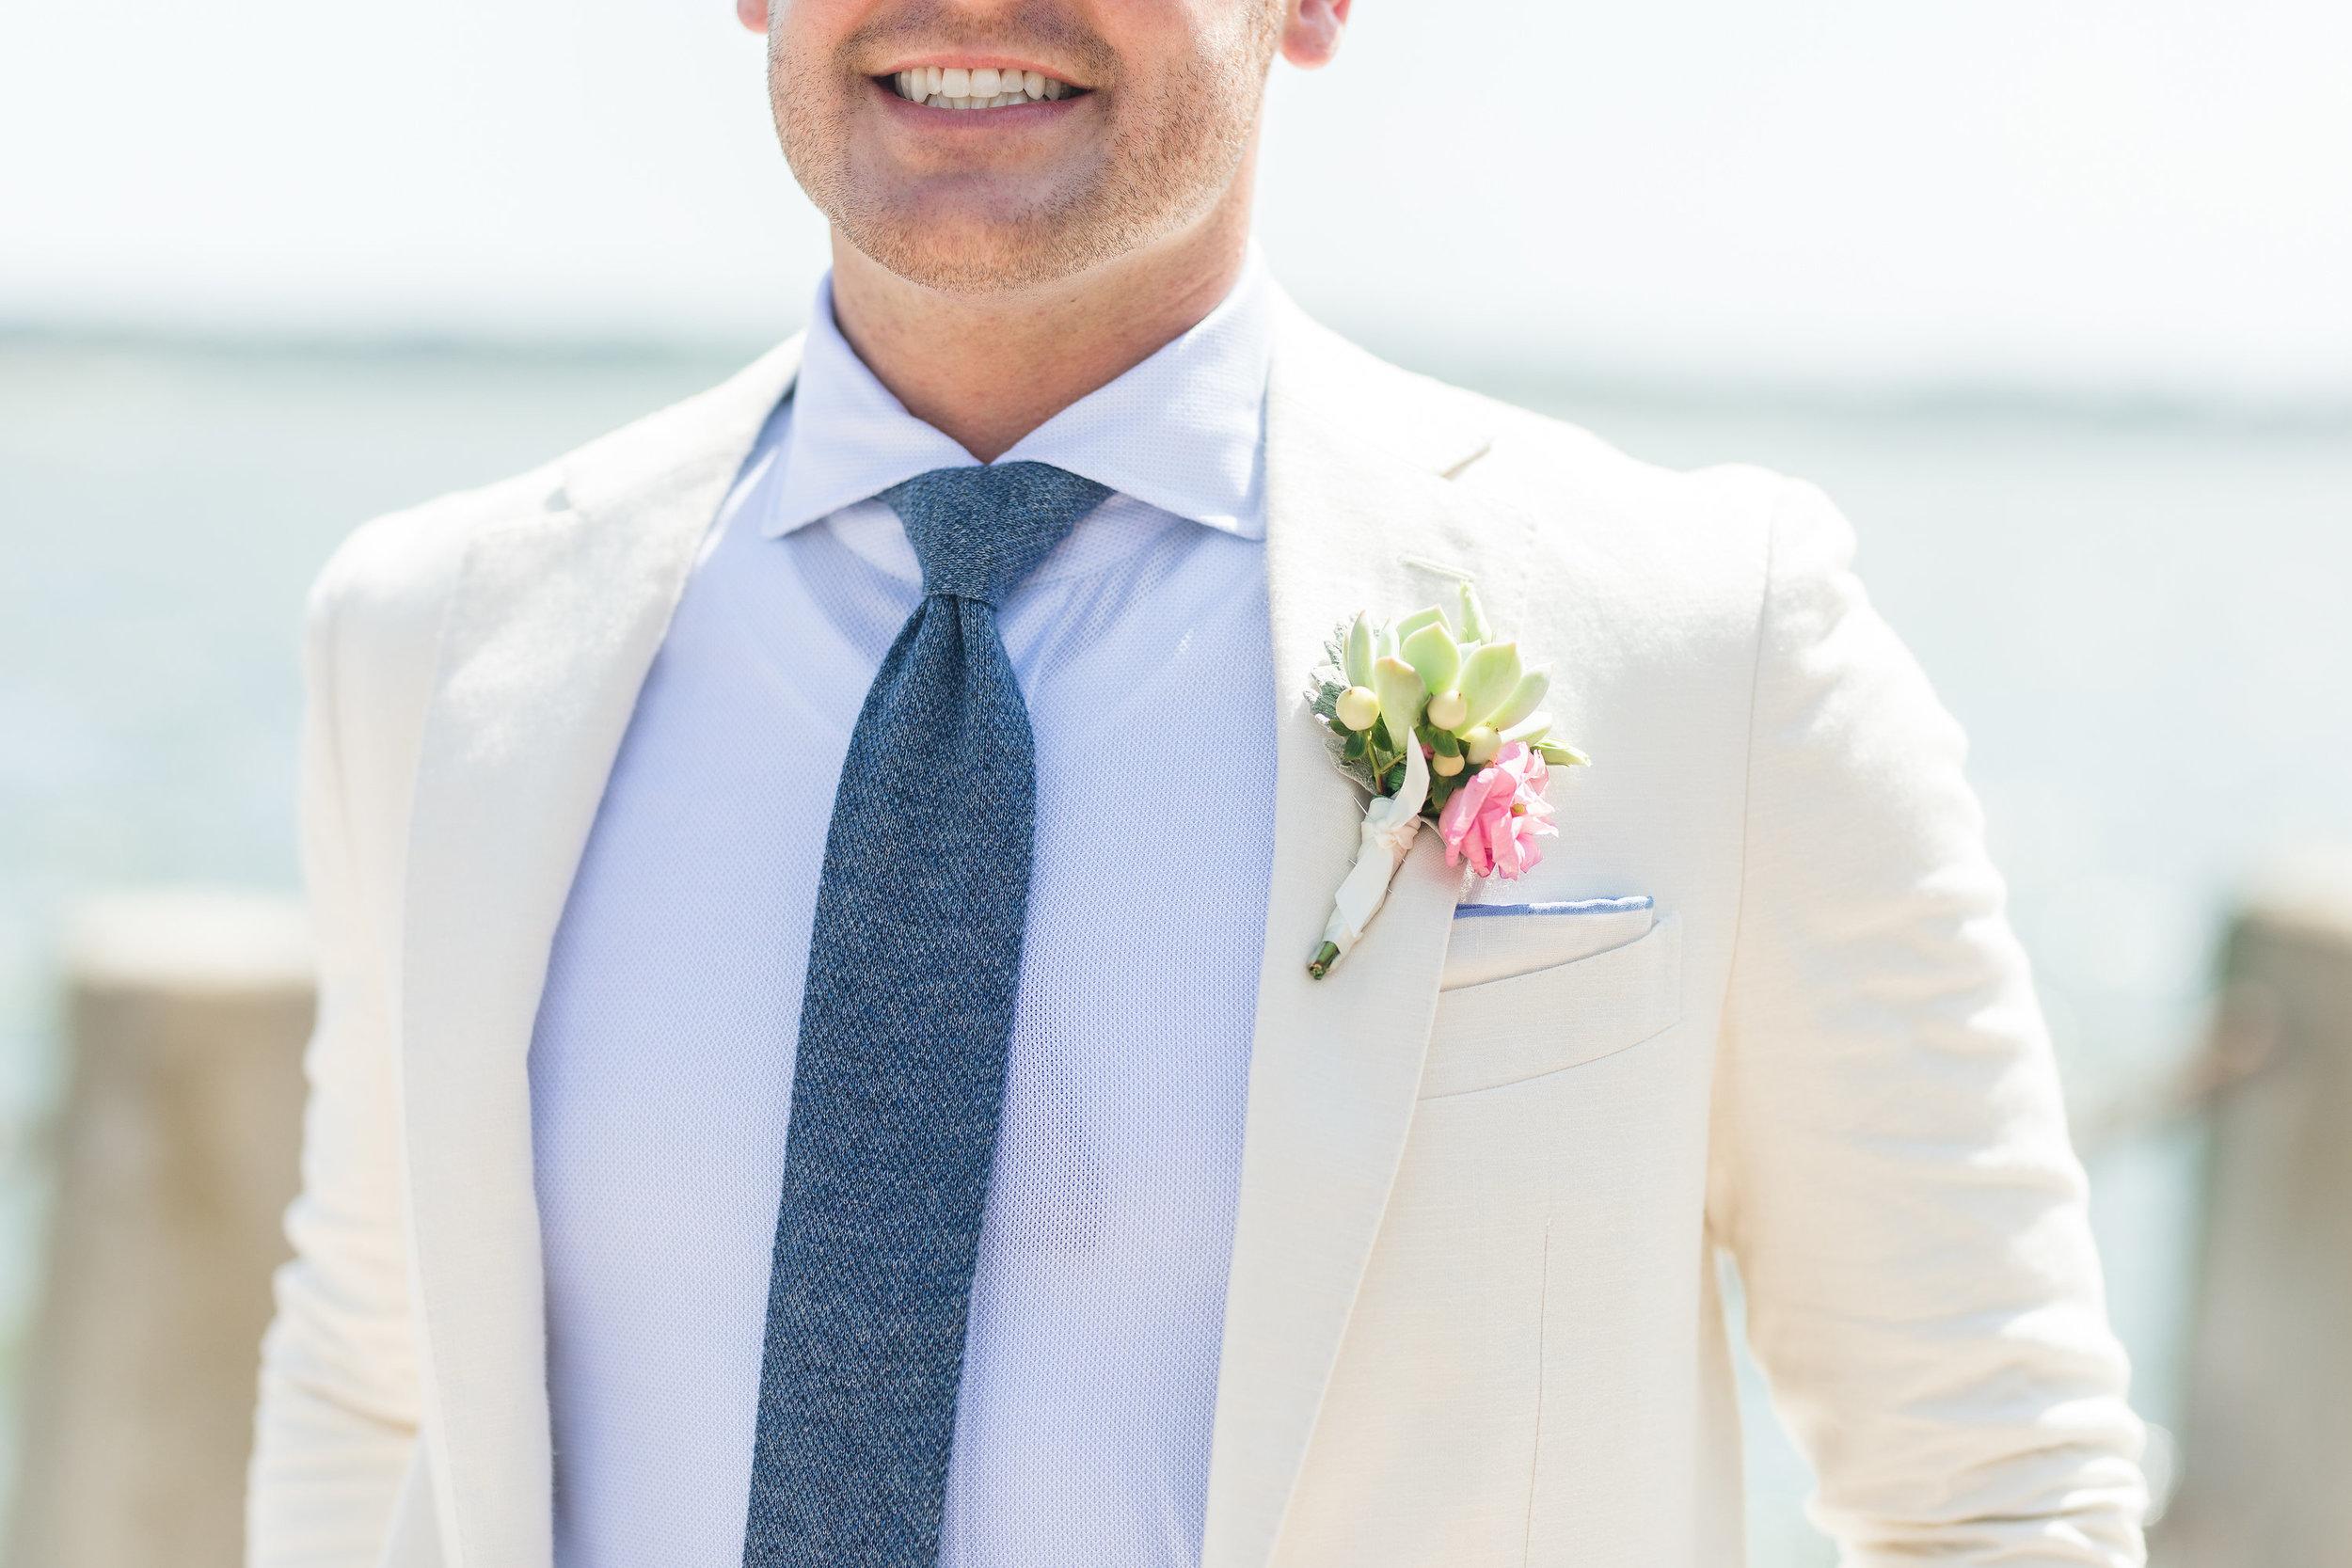 Groom in coastal attire with light blue shirt and dark blue tie  //  Hilton Head wedding photos by Garter + Whiskey